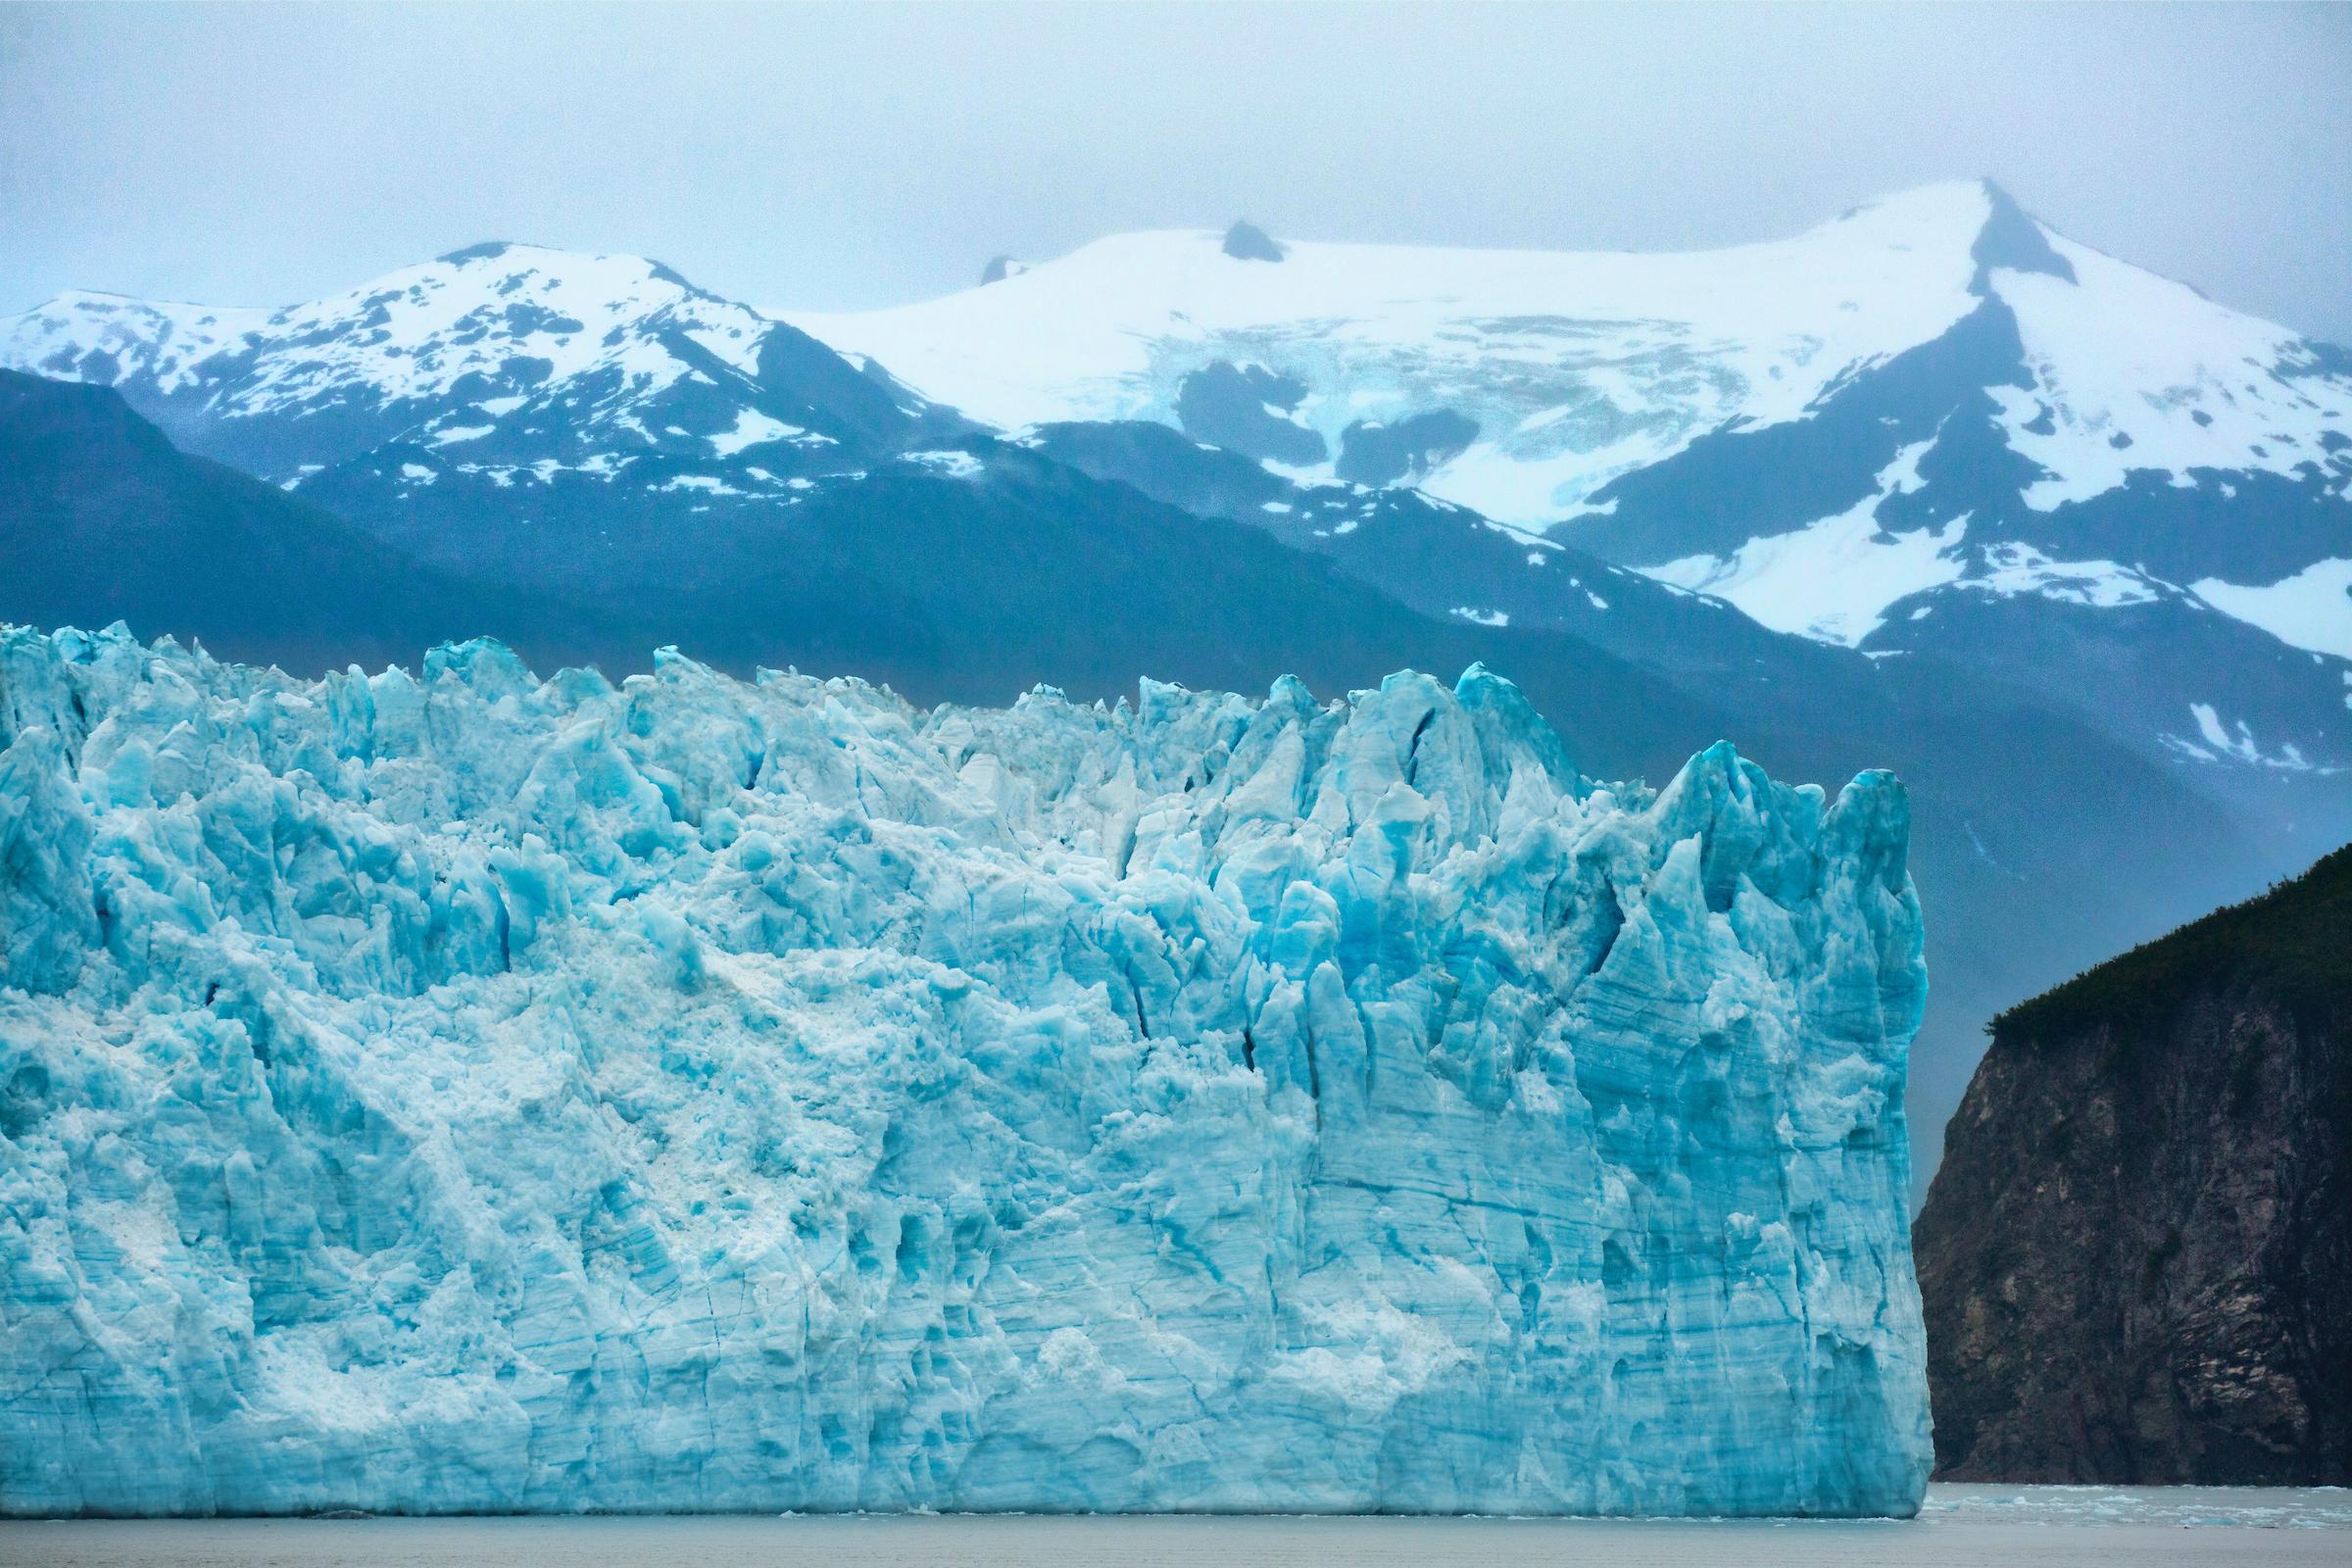 8 Day Luxury Alaska - All Inclusive!